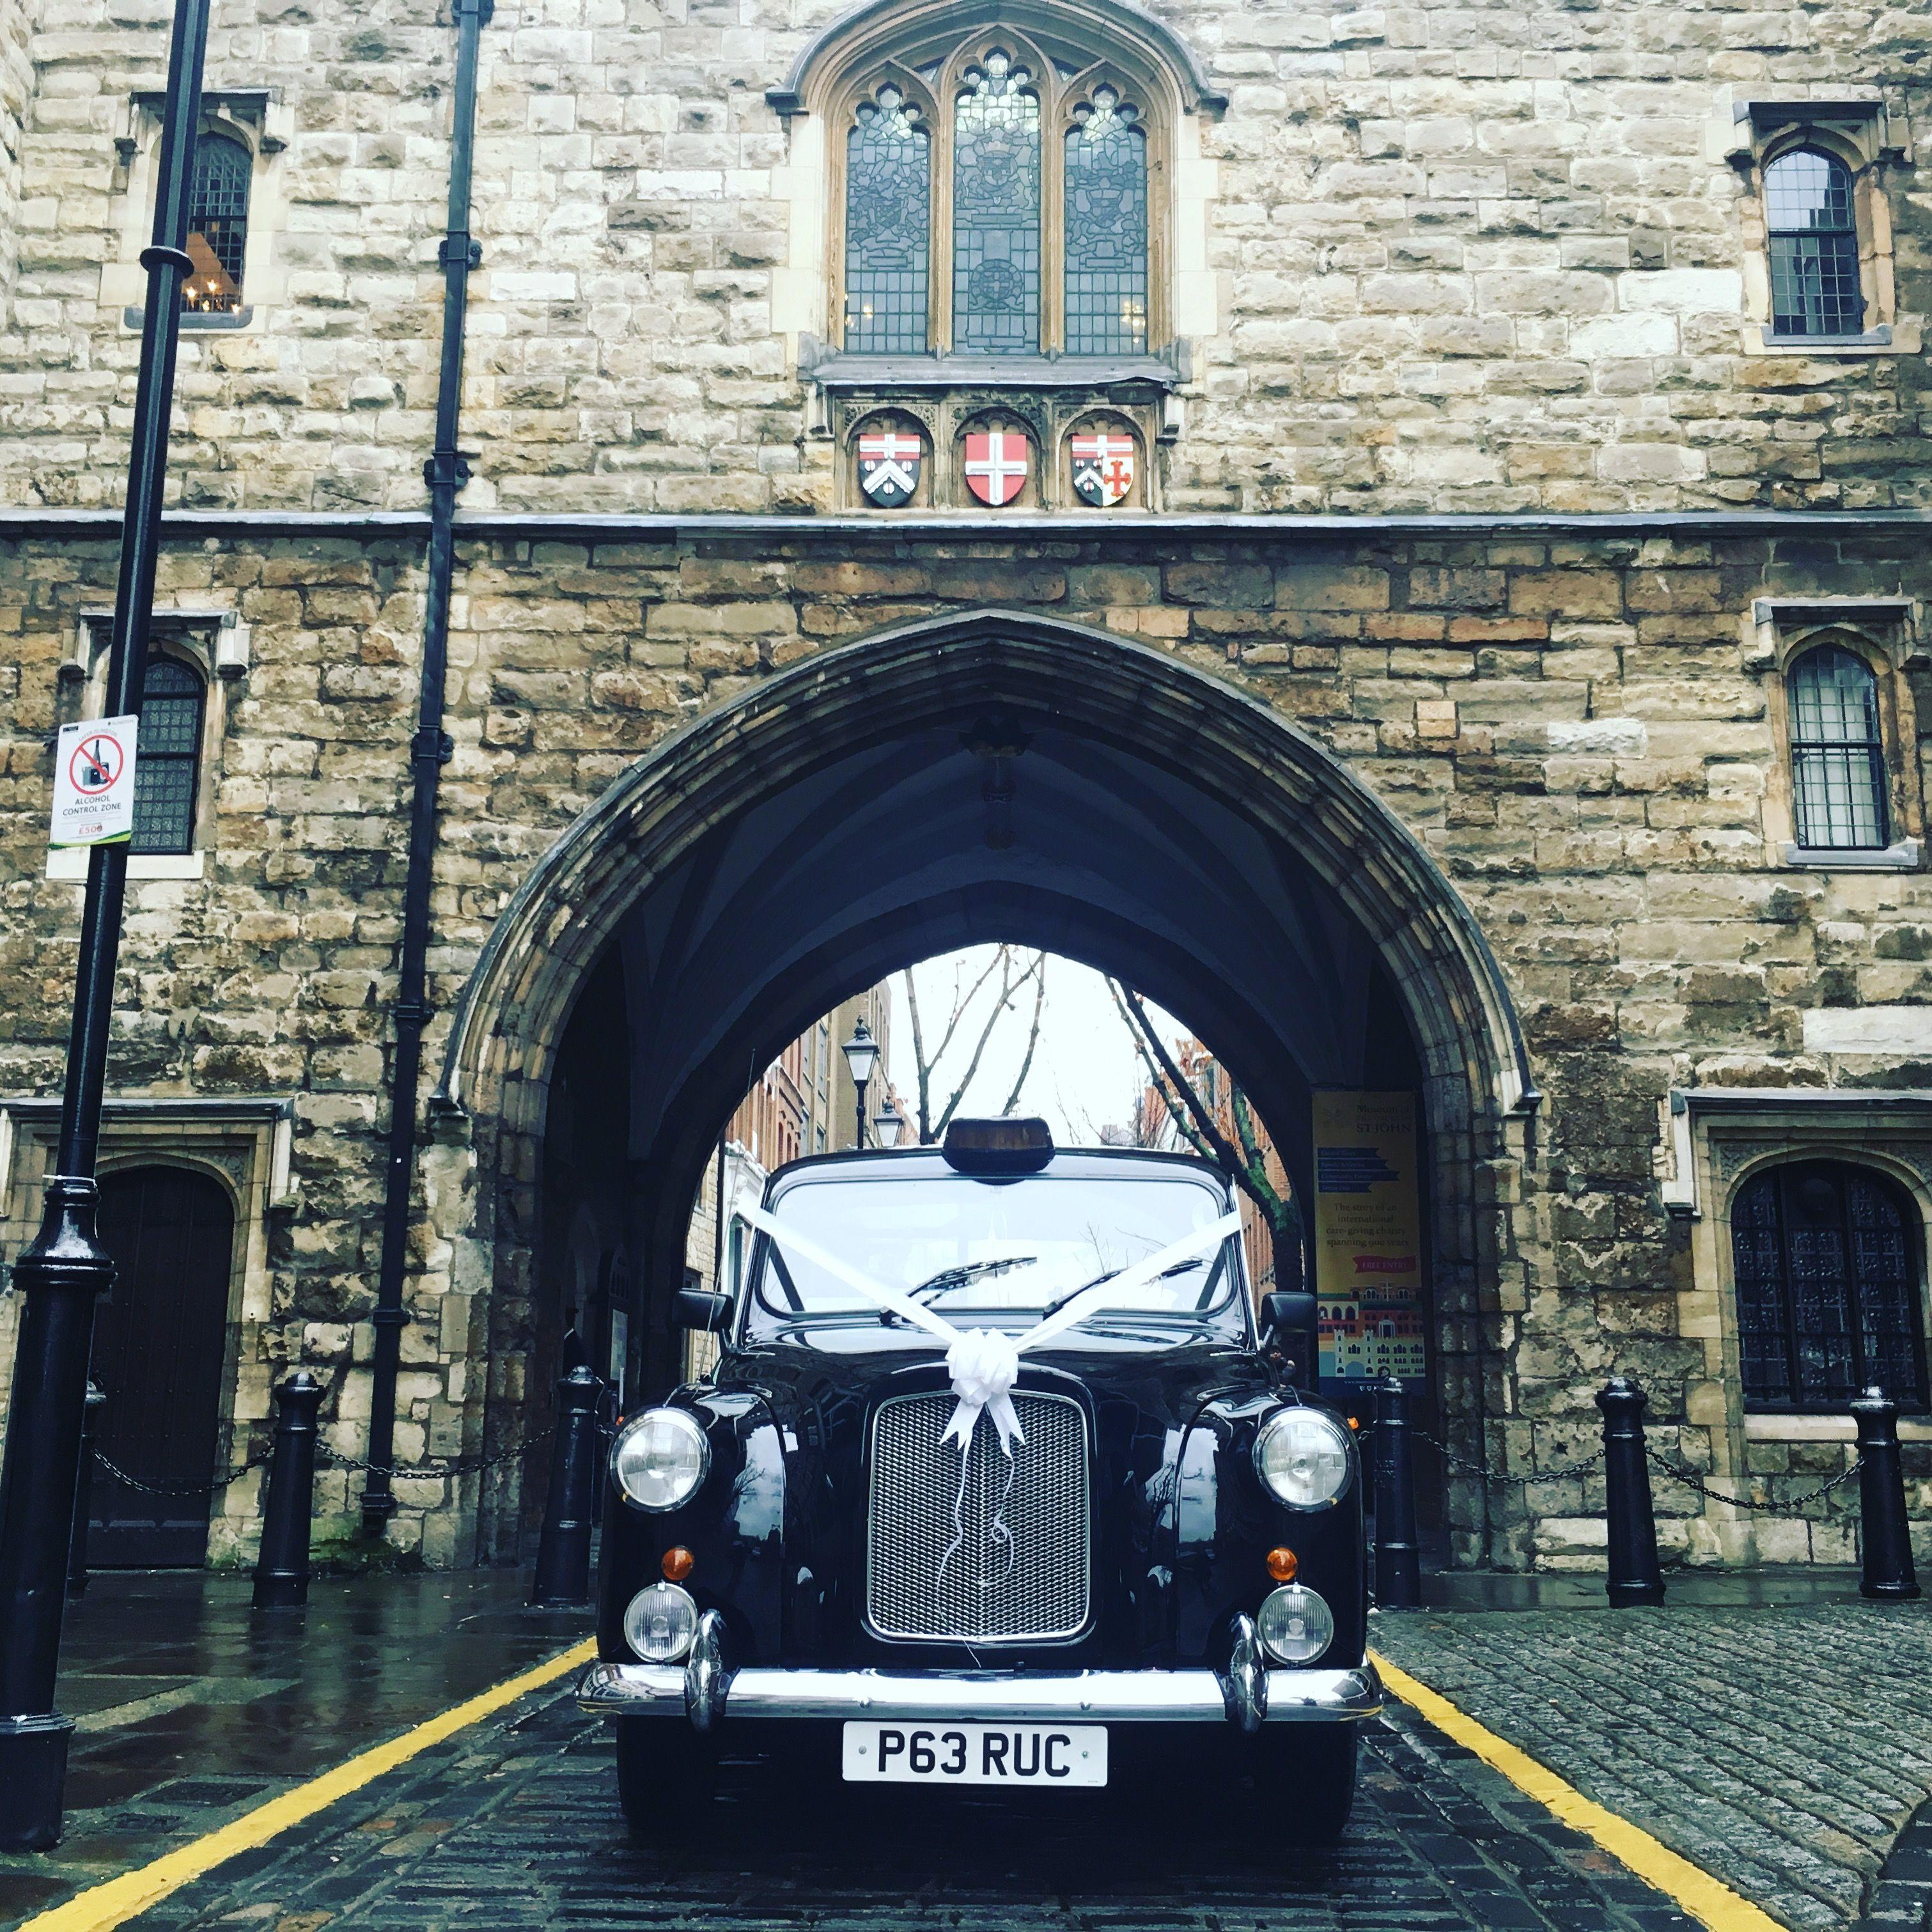 Classic fairway wedding taxi clerkenwell london taxi